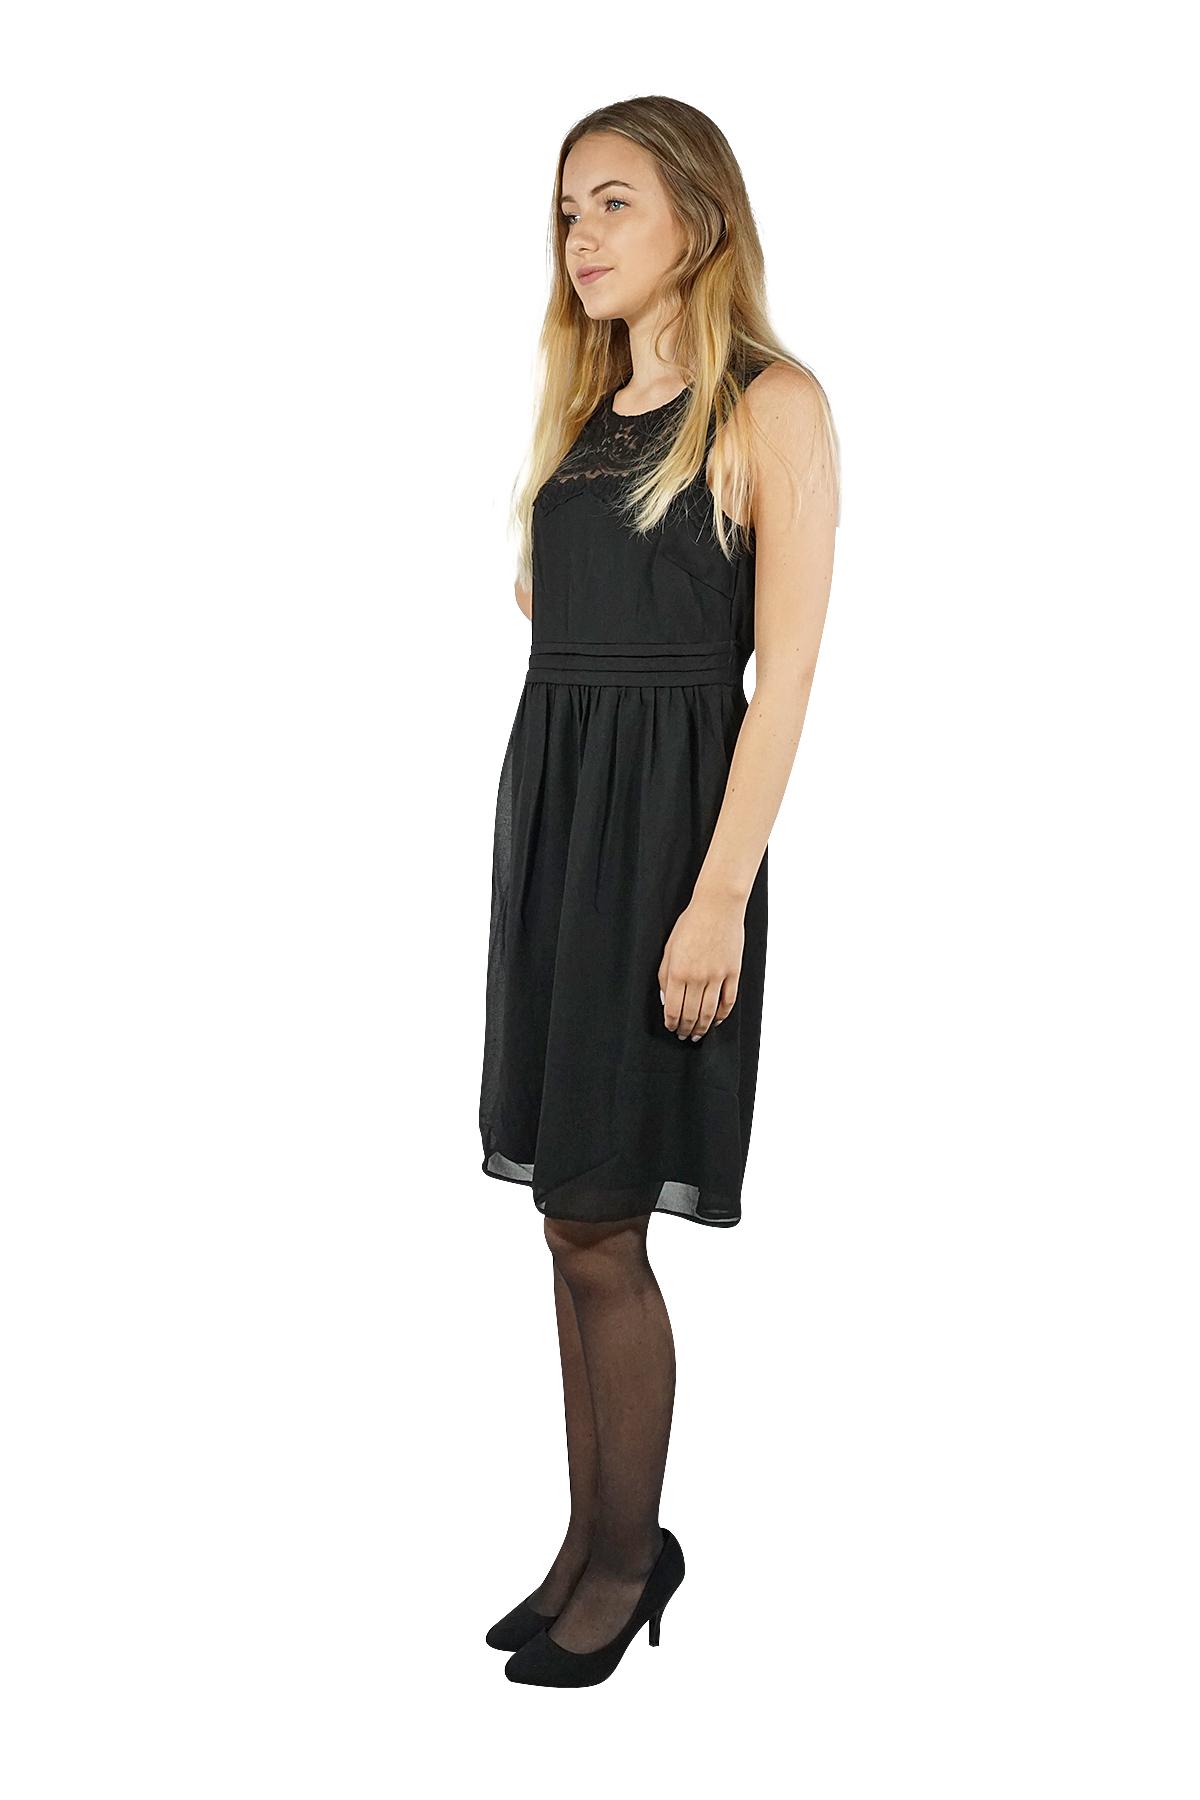 Vero Moda Damen Sommer Kleid kurz mini basic knielang midi ...